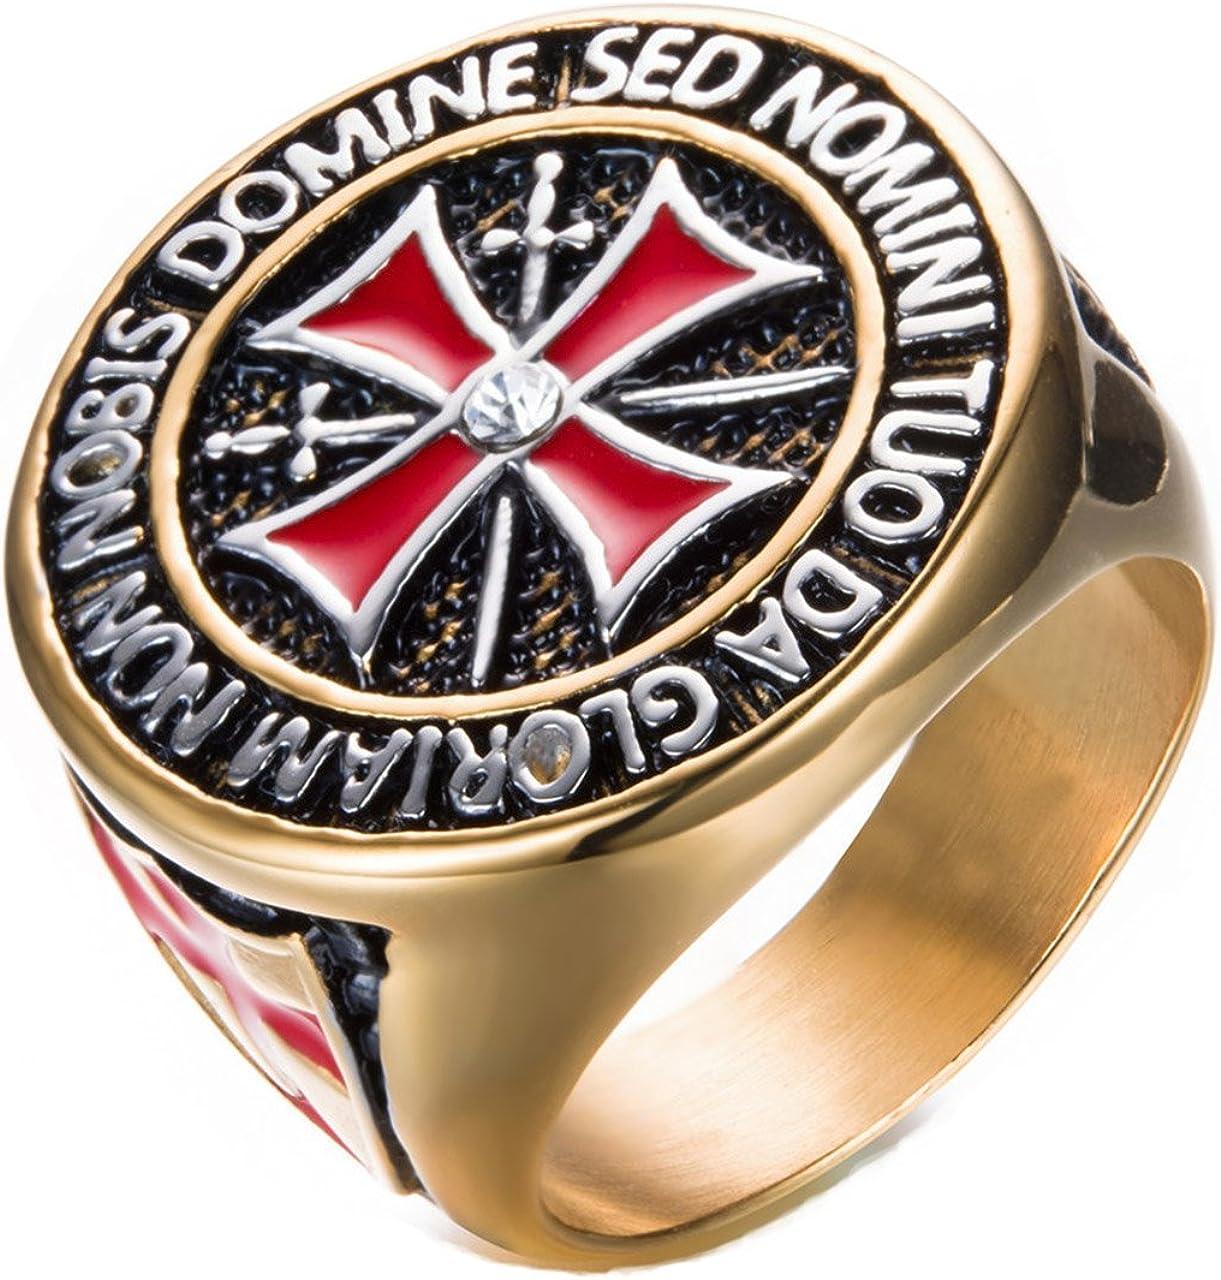 Kebaner para Hombre 316L Acero Inoxidable Vintage Knight Templar Cruz Anillo Oro/Plata Tamaño 8–14